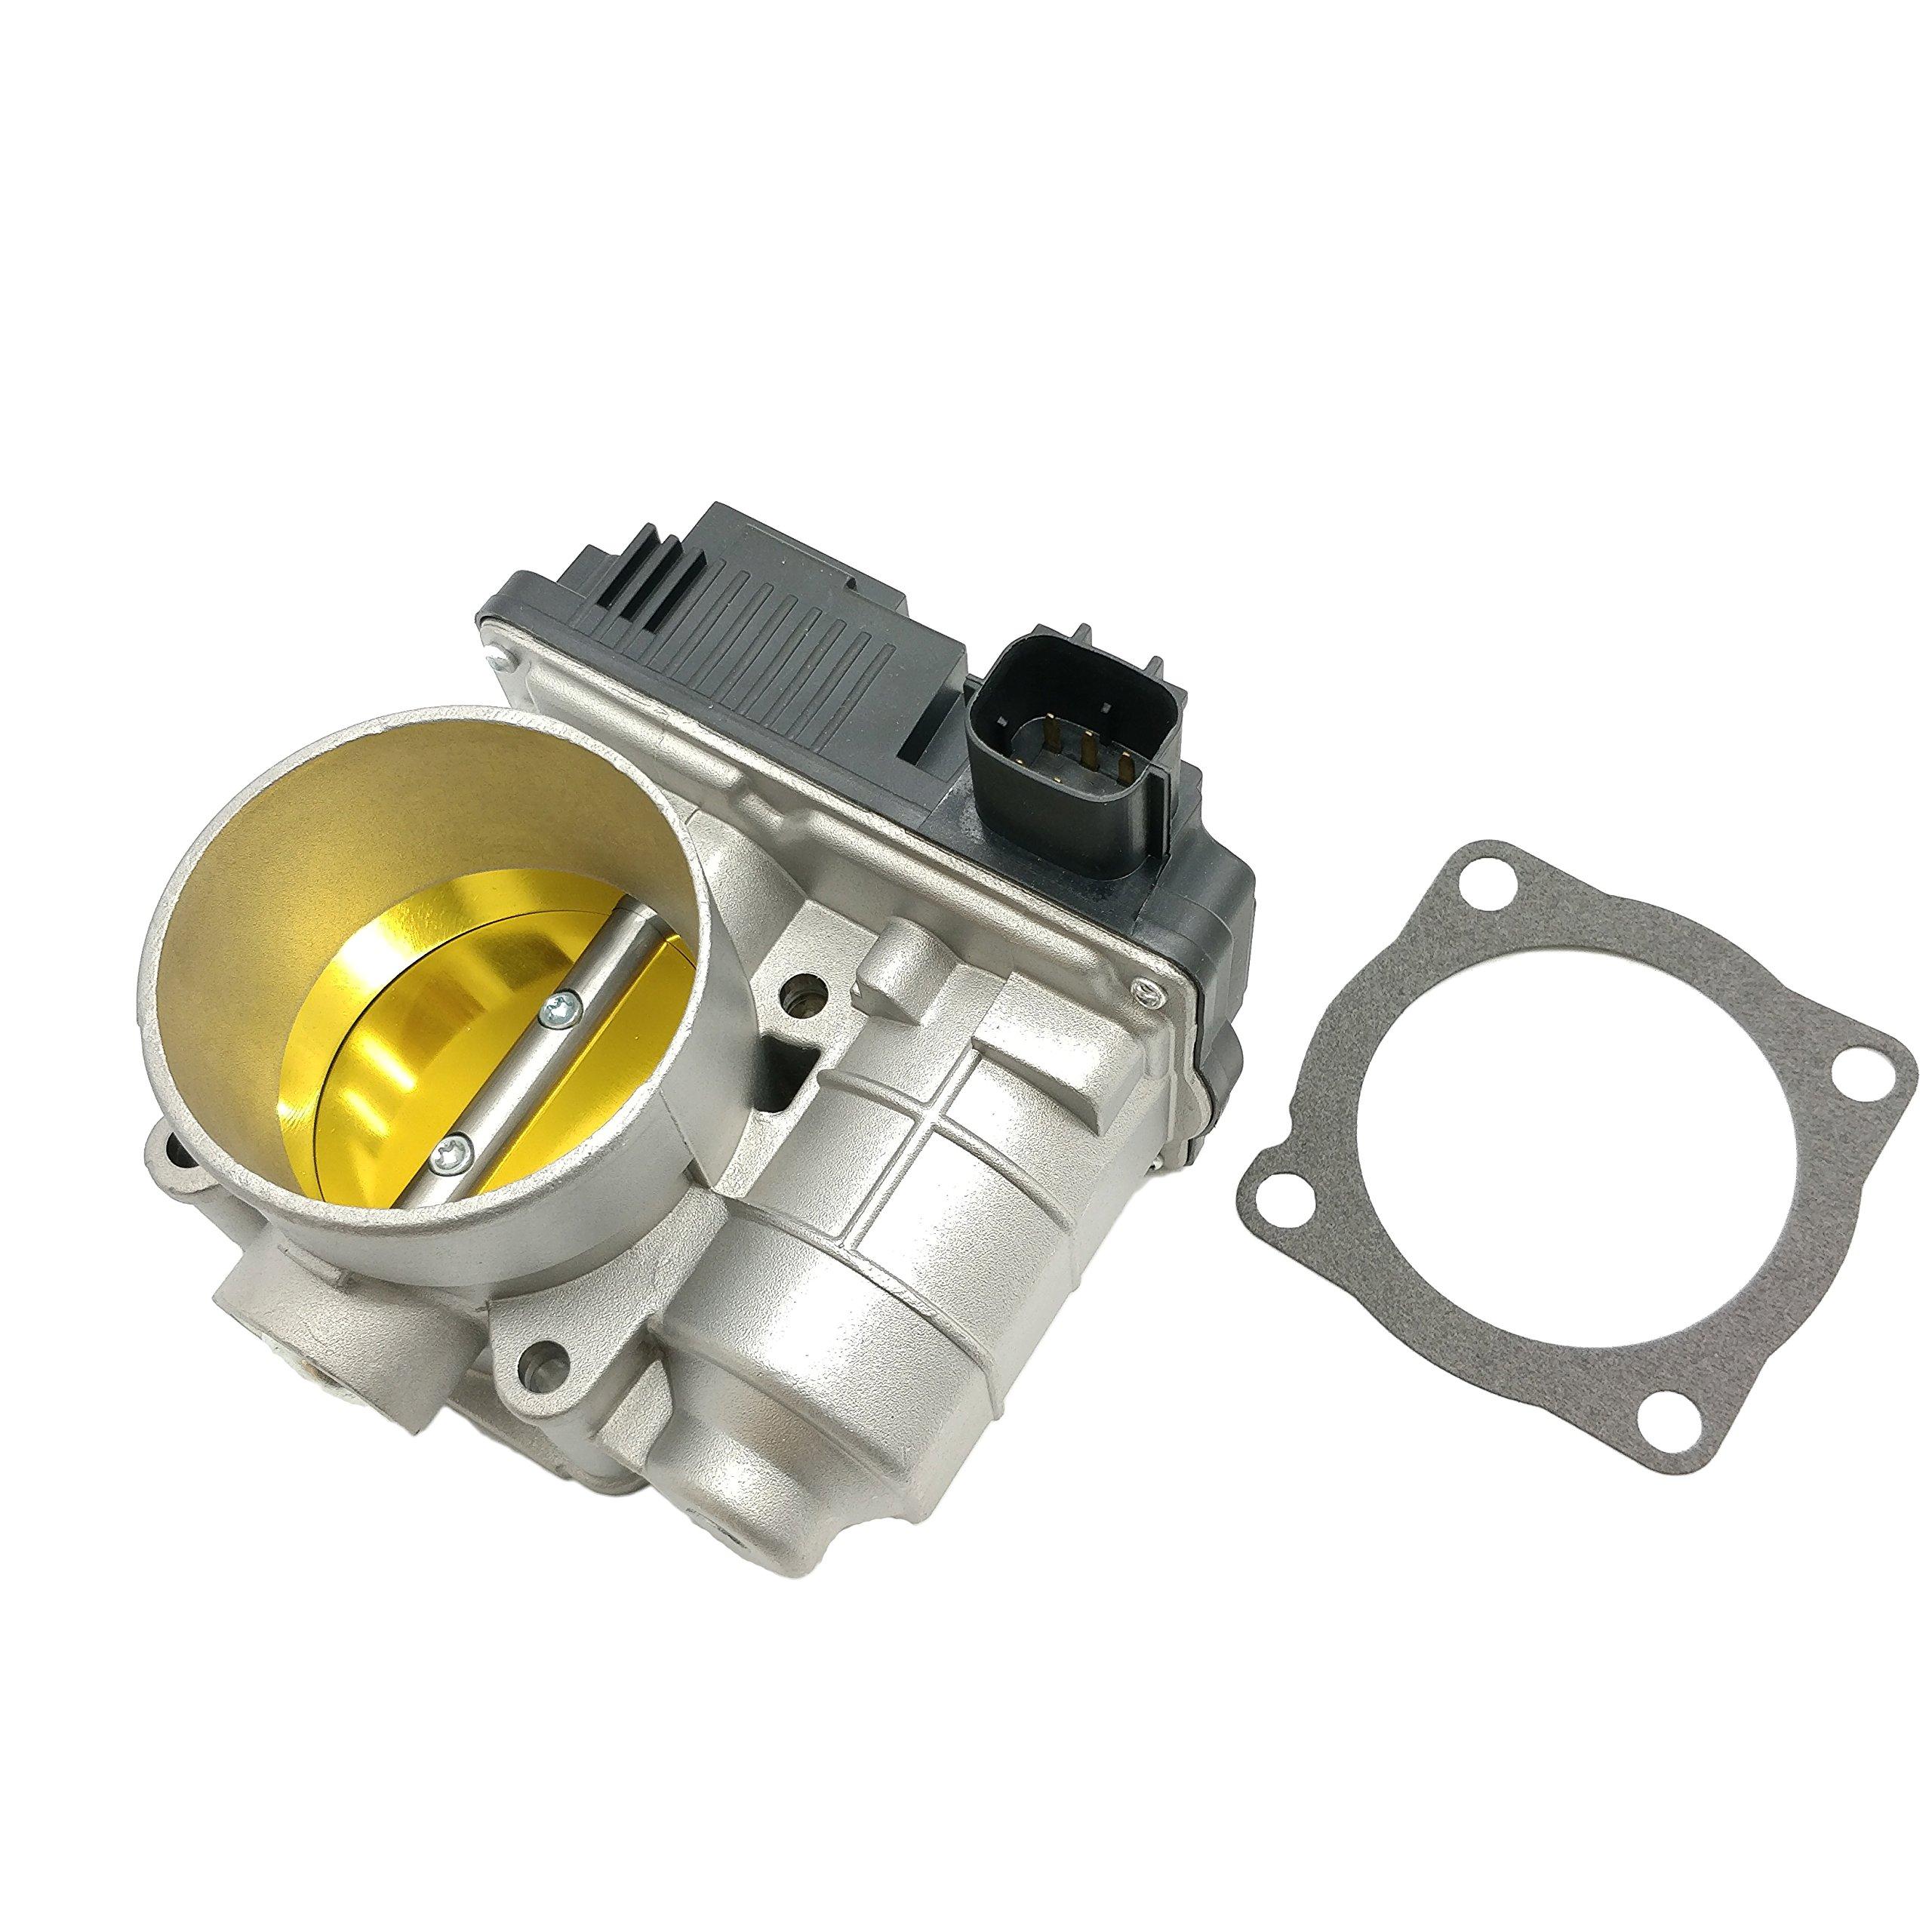 60mm Throttle Body for 2002-2005 Nissan Altima Sentra X-Trail 2.5L QR25DE 16119AE013 by Nova Parts Sales